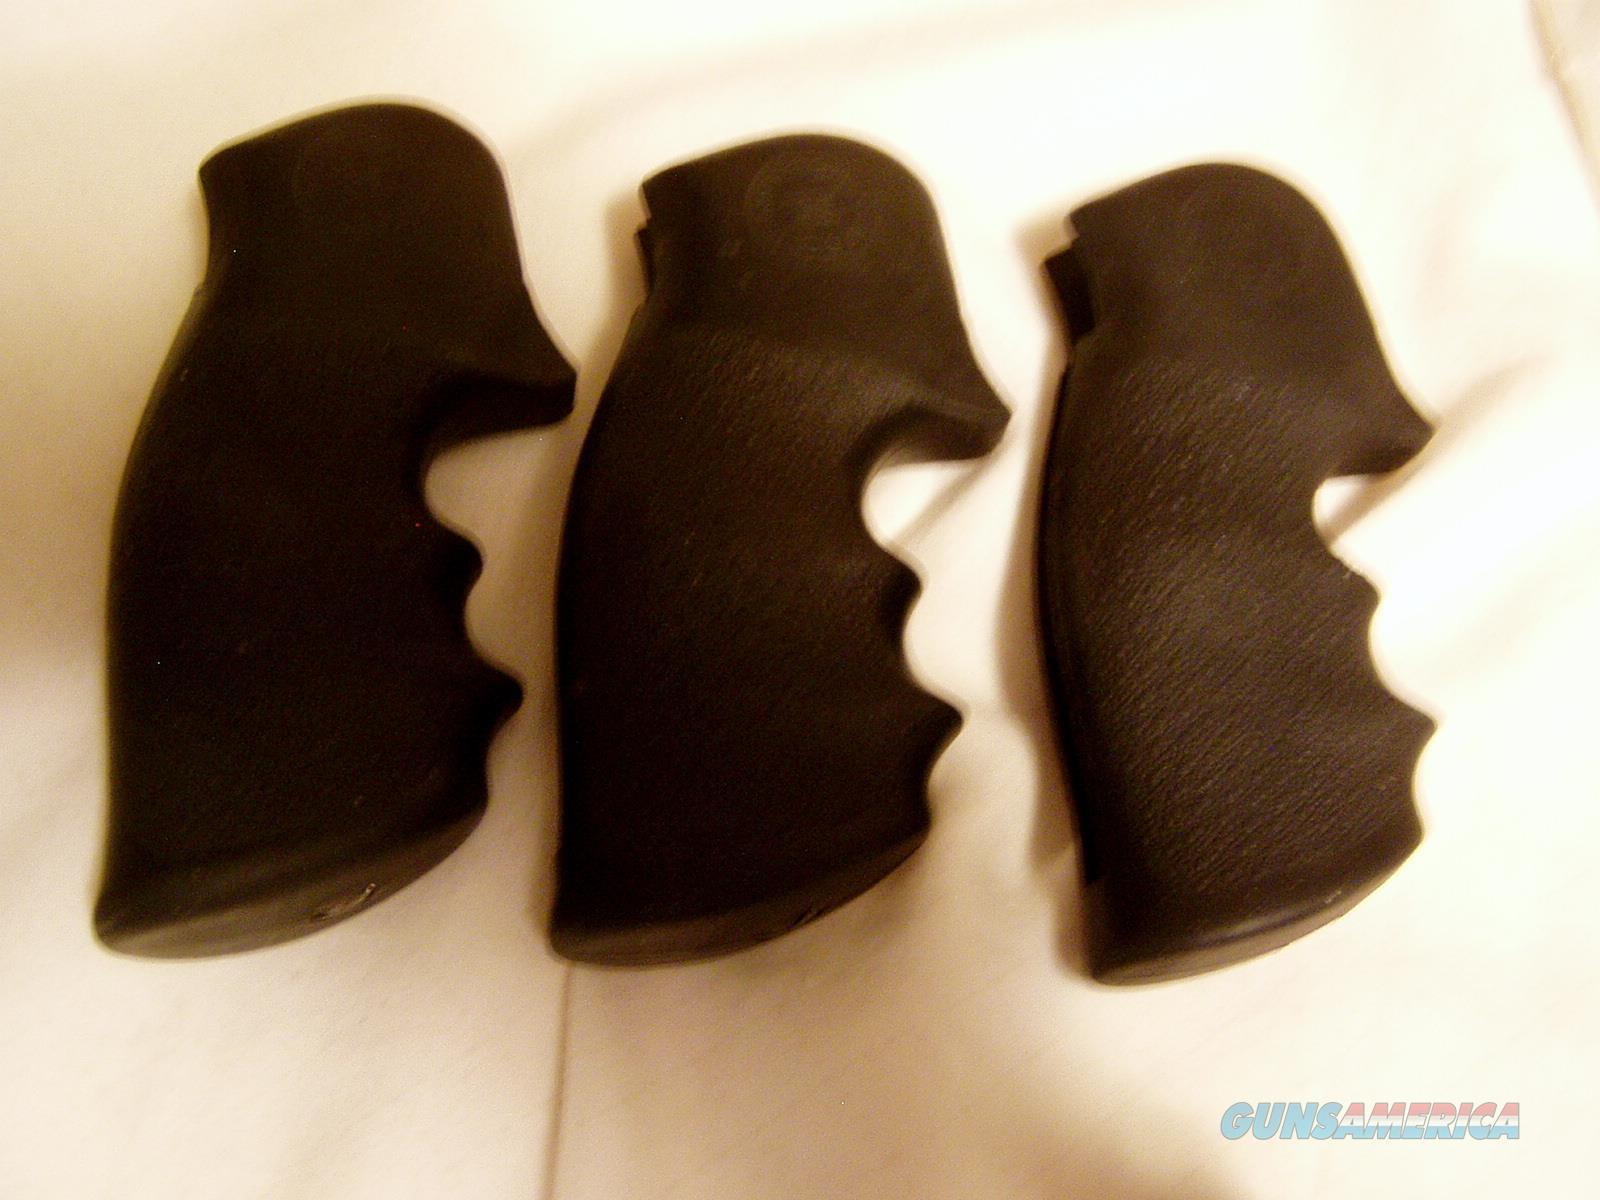 USED  BLACK HOGUE S & W SQUARE BUTT  FINGER GROVE OPEN BACK STRAP $ 55 DELIVERED  Non-Guns > Gunstocks, Grips & Wood